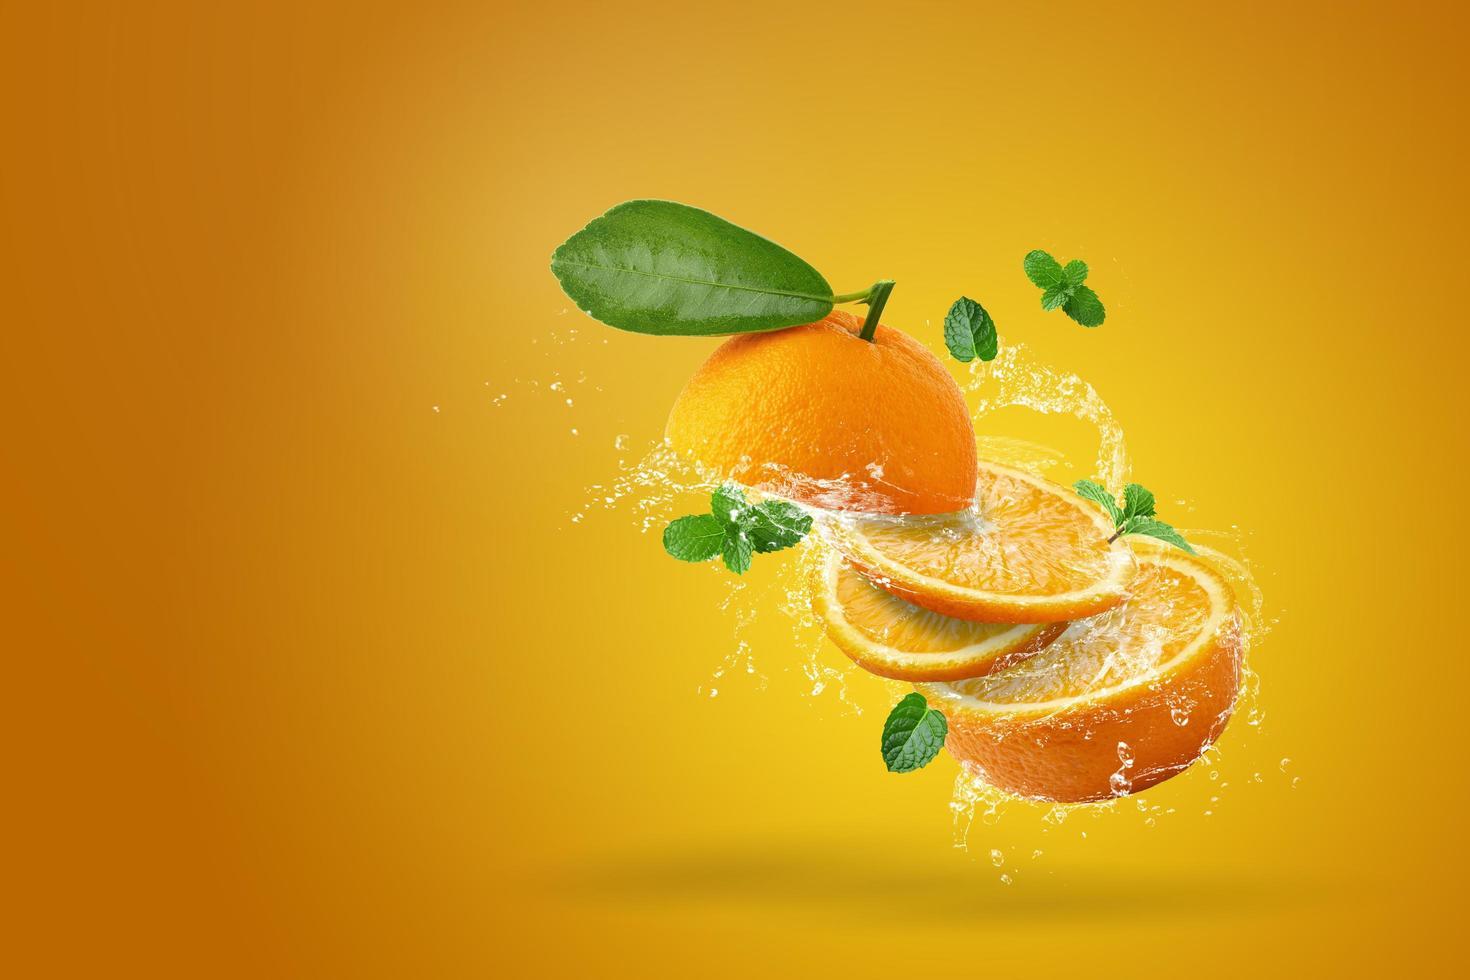 Water splashing on fresh sliced orange  photo